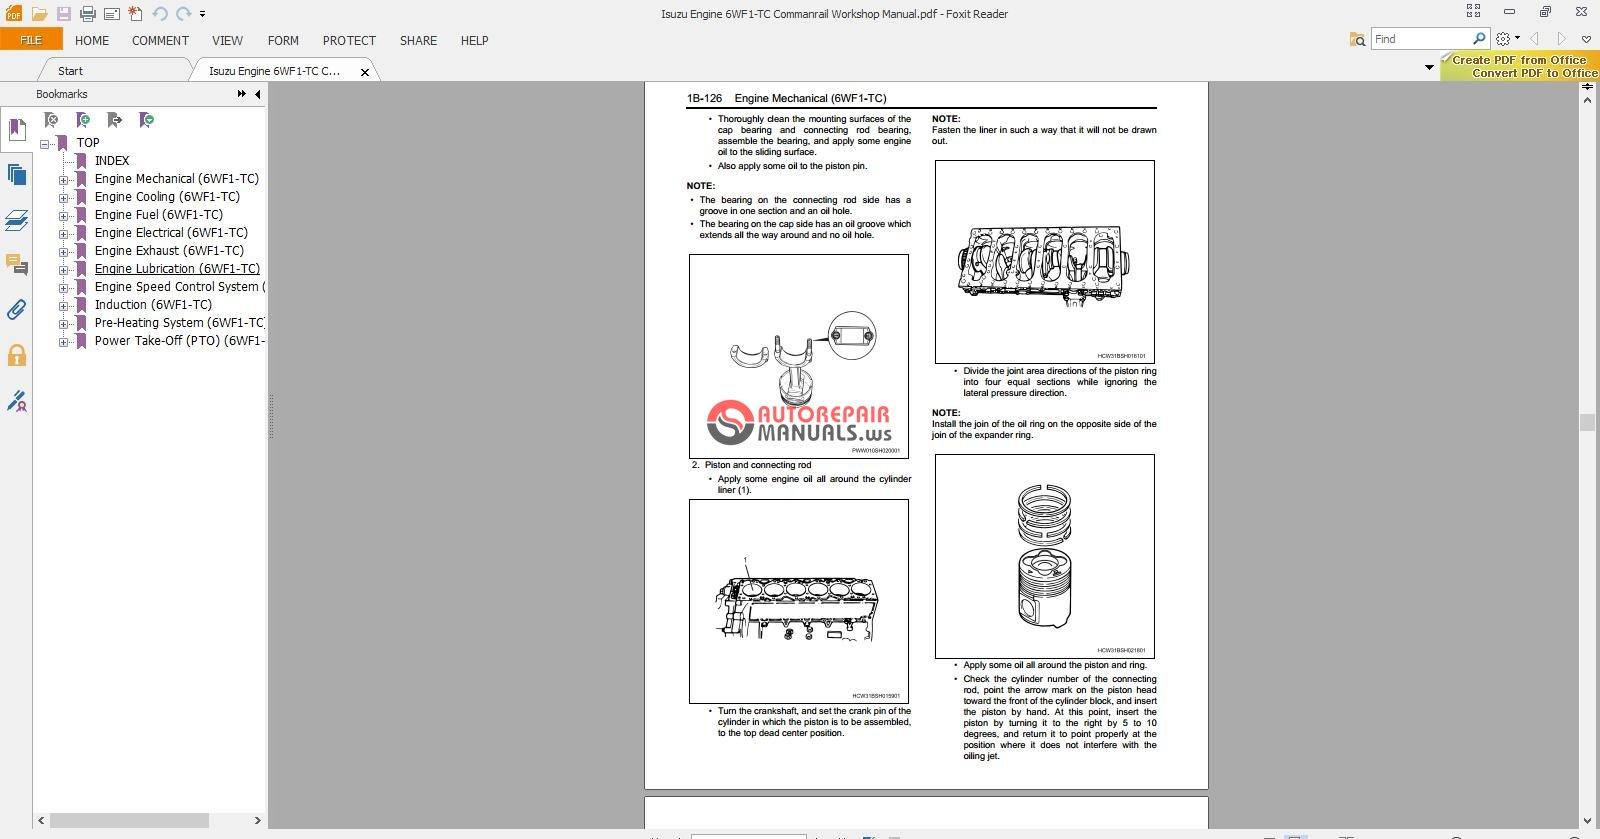 hight resolution of  isuzu engine 6wf1 tc commanrail workshop manual 3 jpg